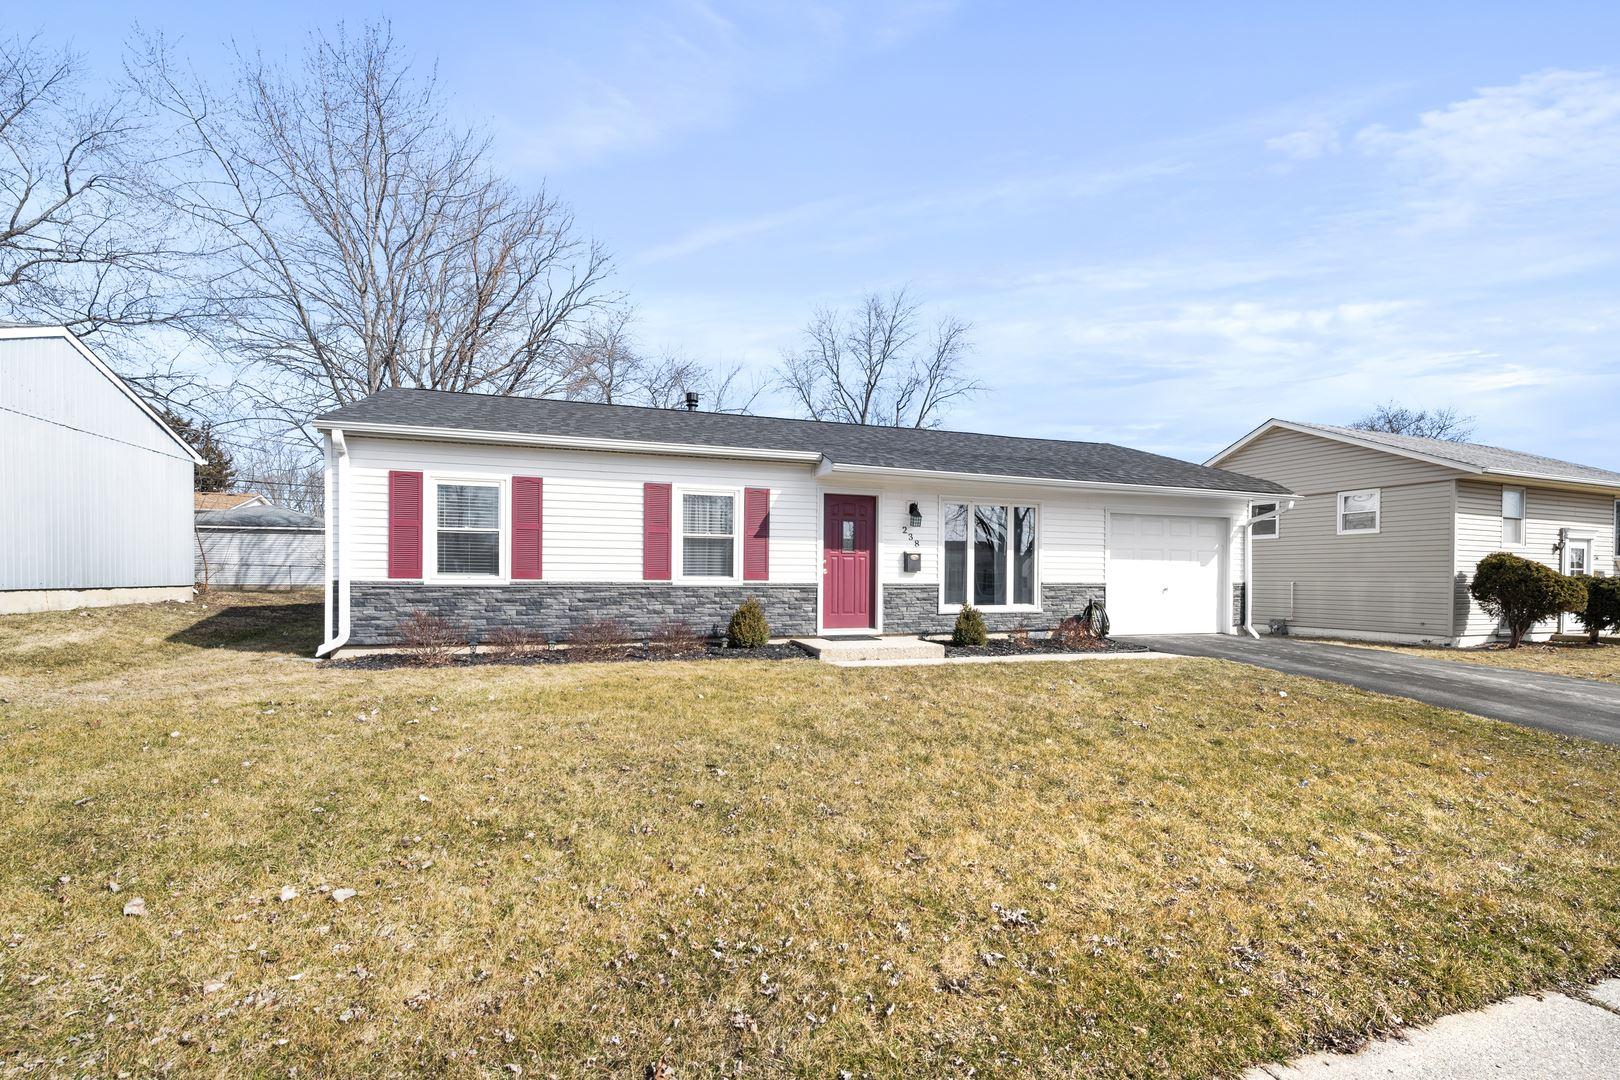 Photo of 238 Tallman Avenue, Romeoville, IL 60446 (MLS # 11014059)